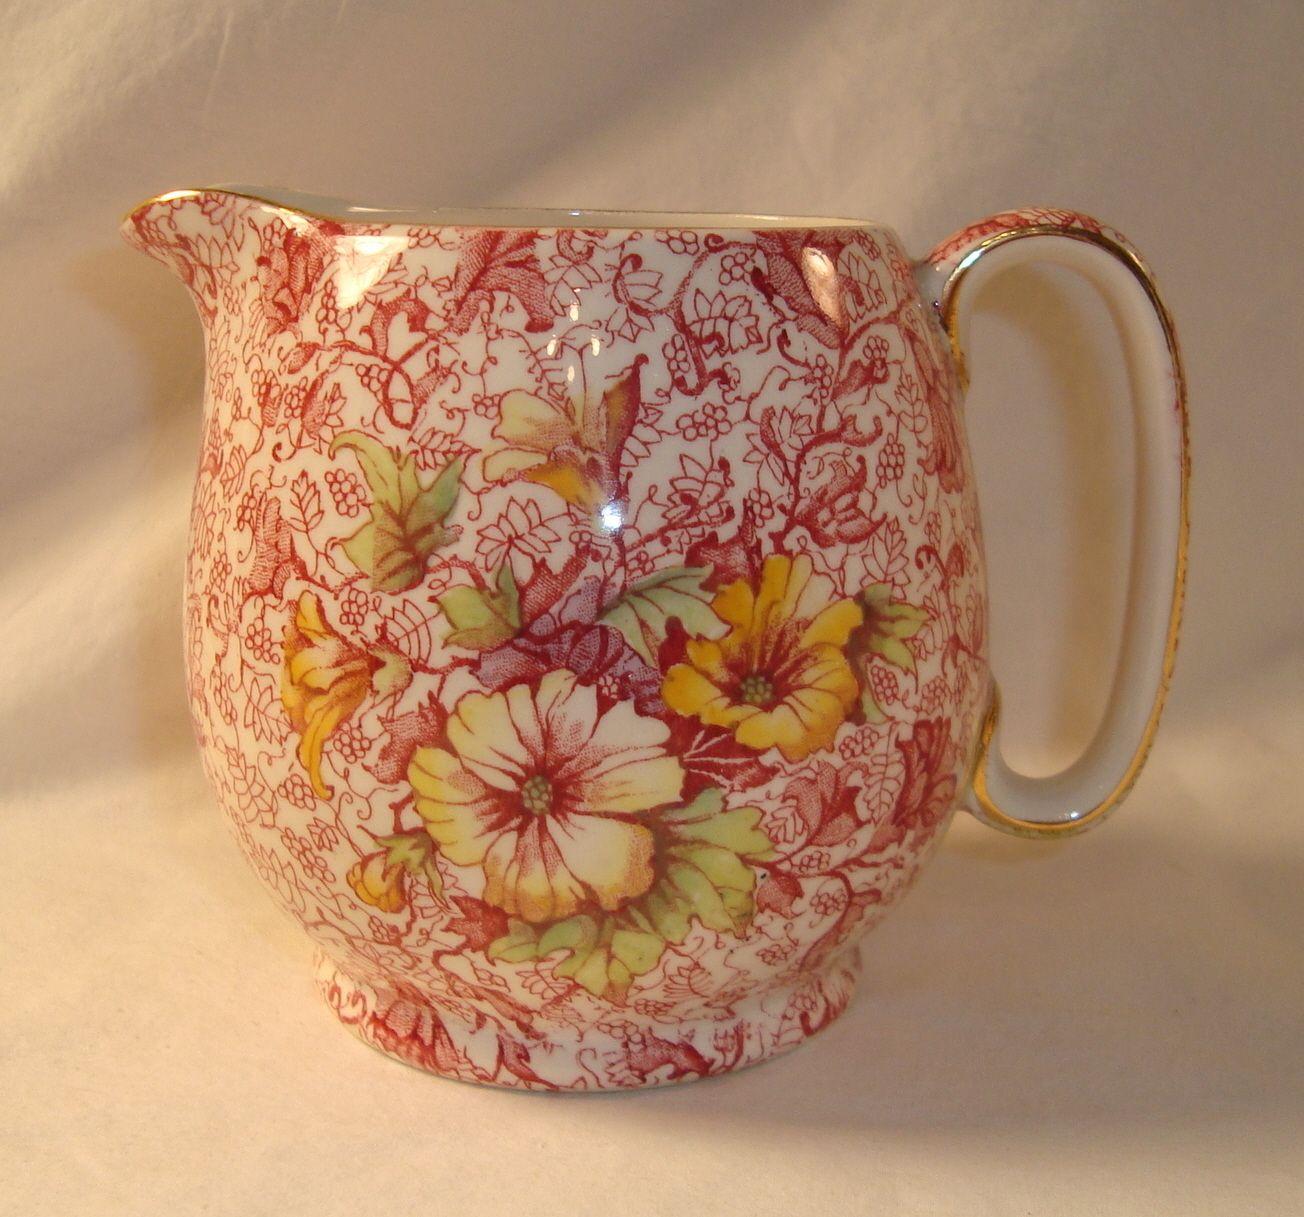 Royal winton grimwades dorset pink floral chintz 32 oz pitcher royal winton grimwades dorset pink floral chintz 32 oz pitcher small china cream reviewsmspy